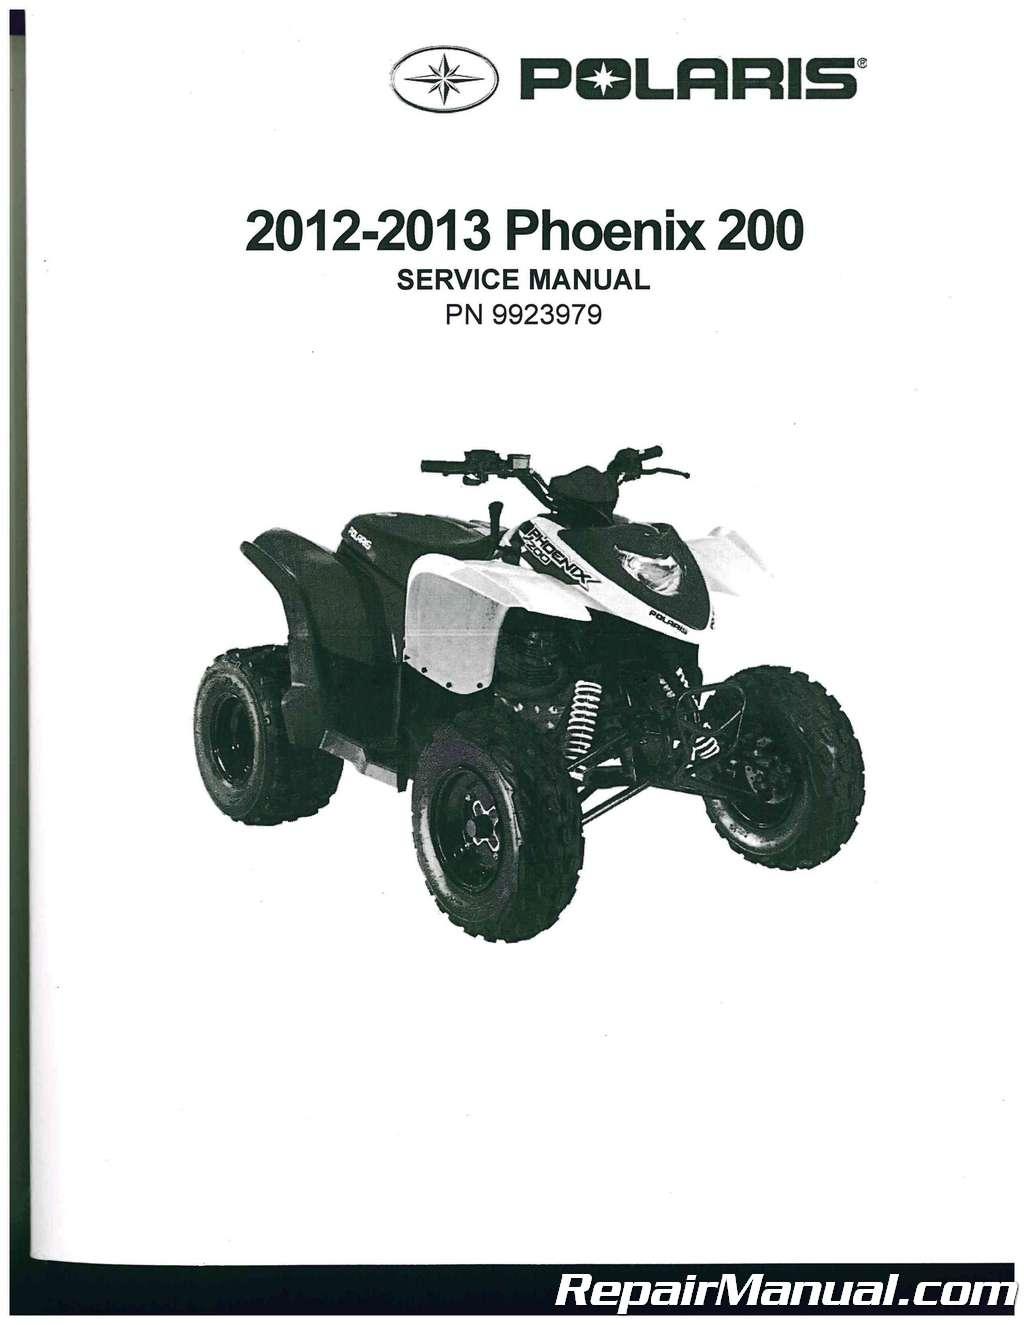 Polaris xlt shop manual manual rh repairmanual com array 1998 polaris indy 500 coil insurance on cars rh insuranceoncars club fandeluxe Gallery